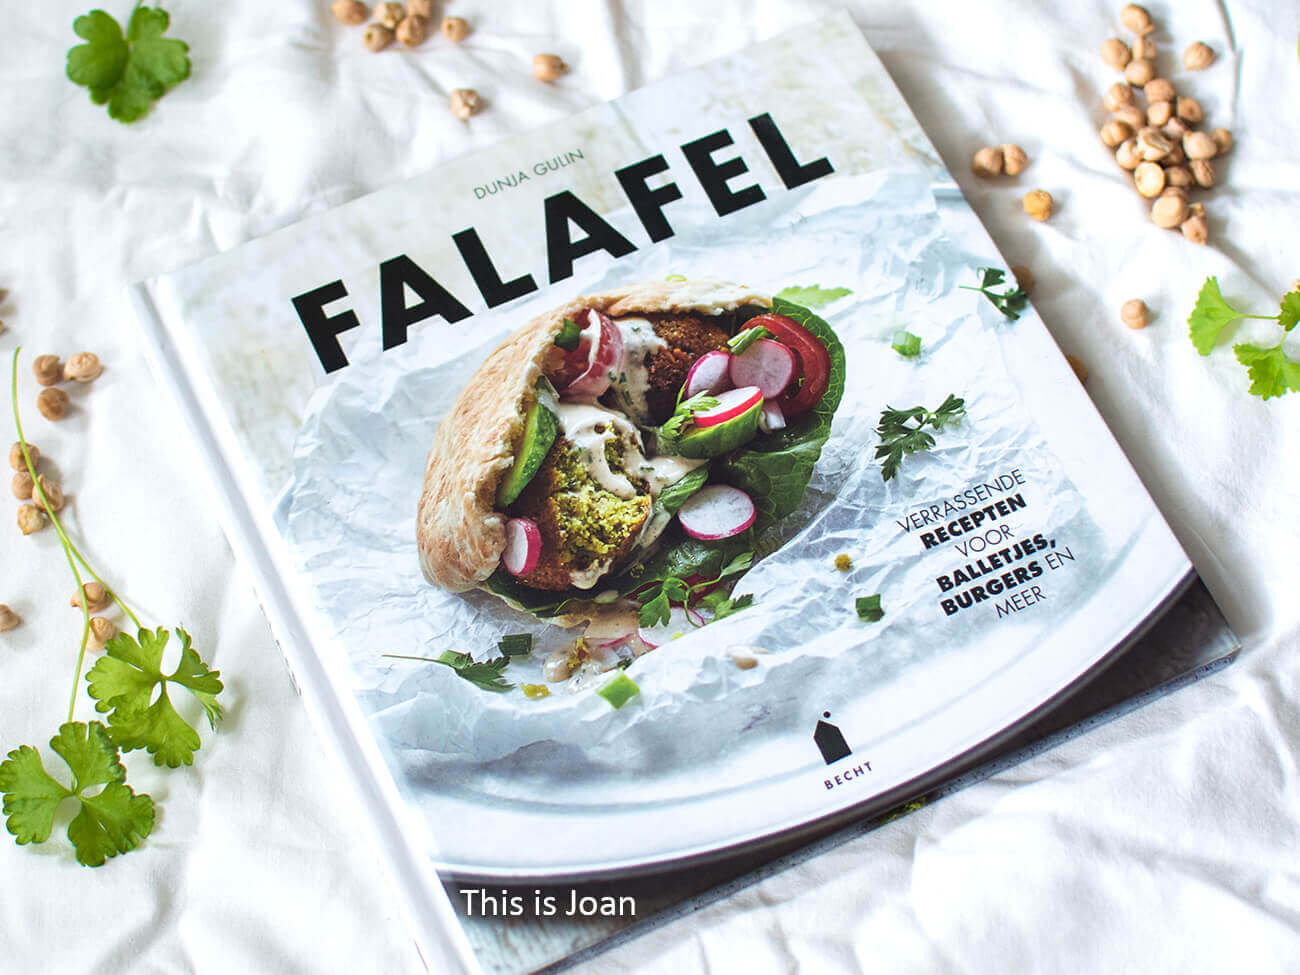 Falafel kookboek Dunja Gulin